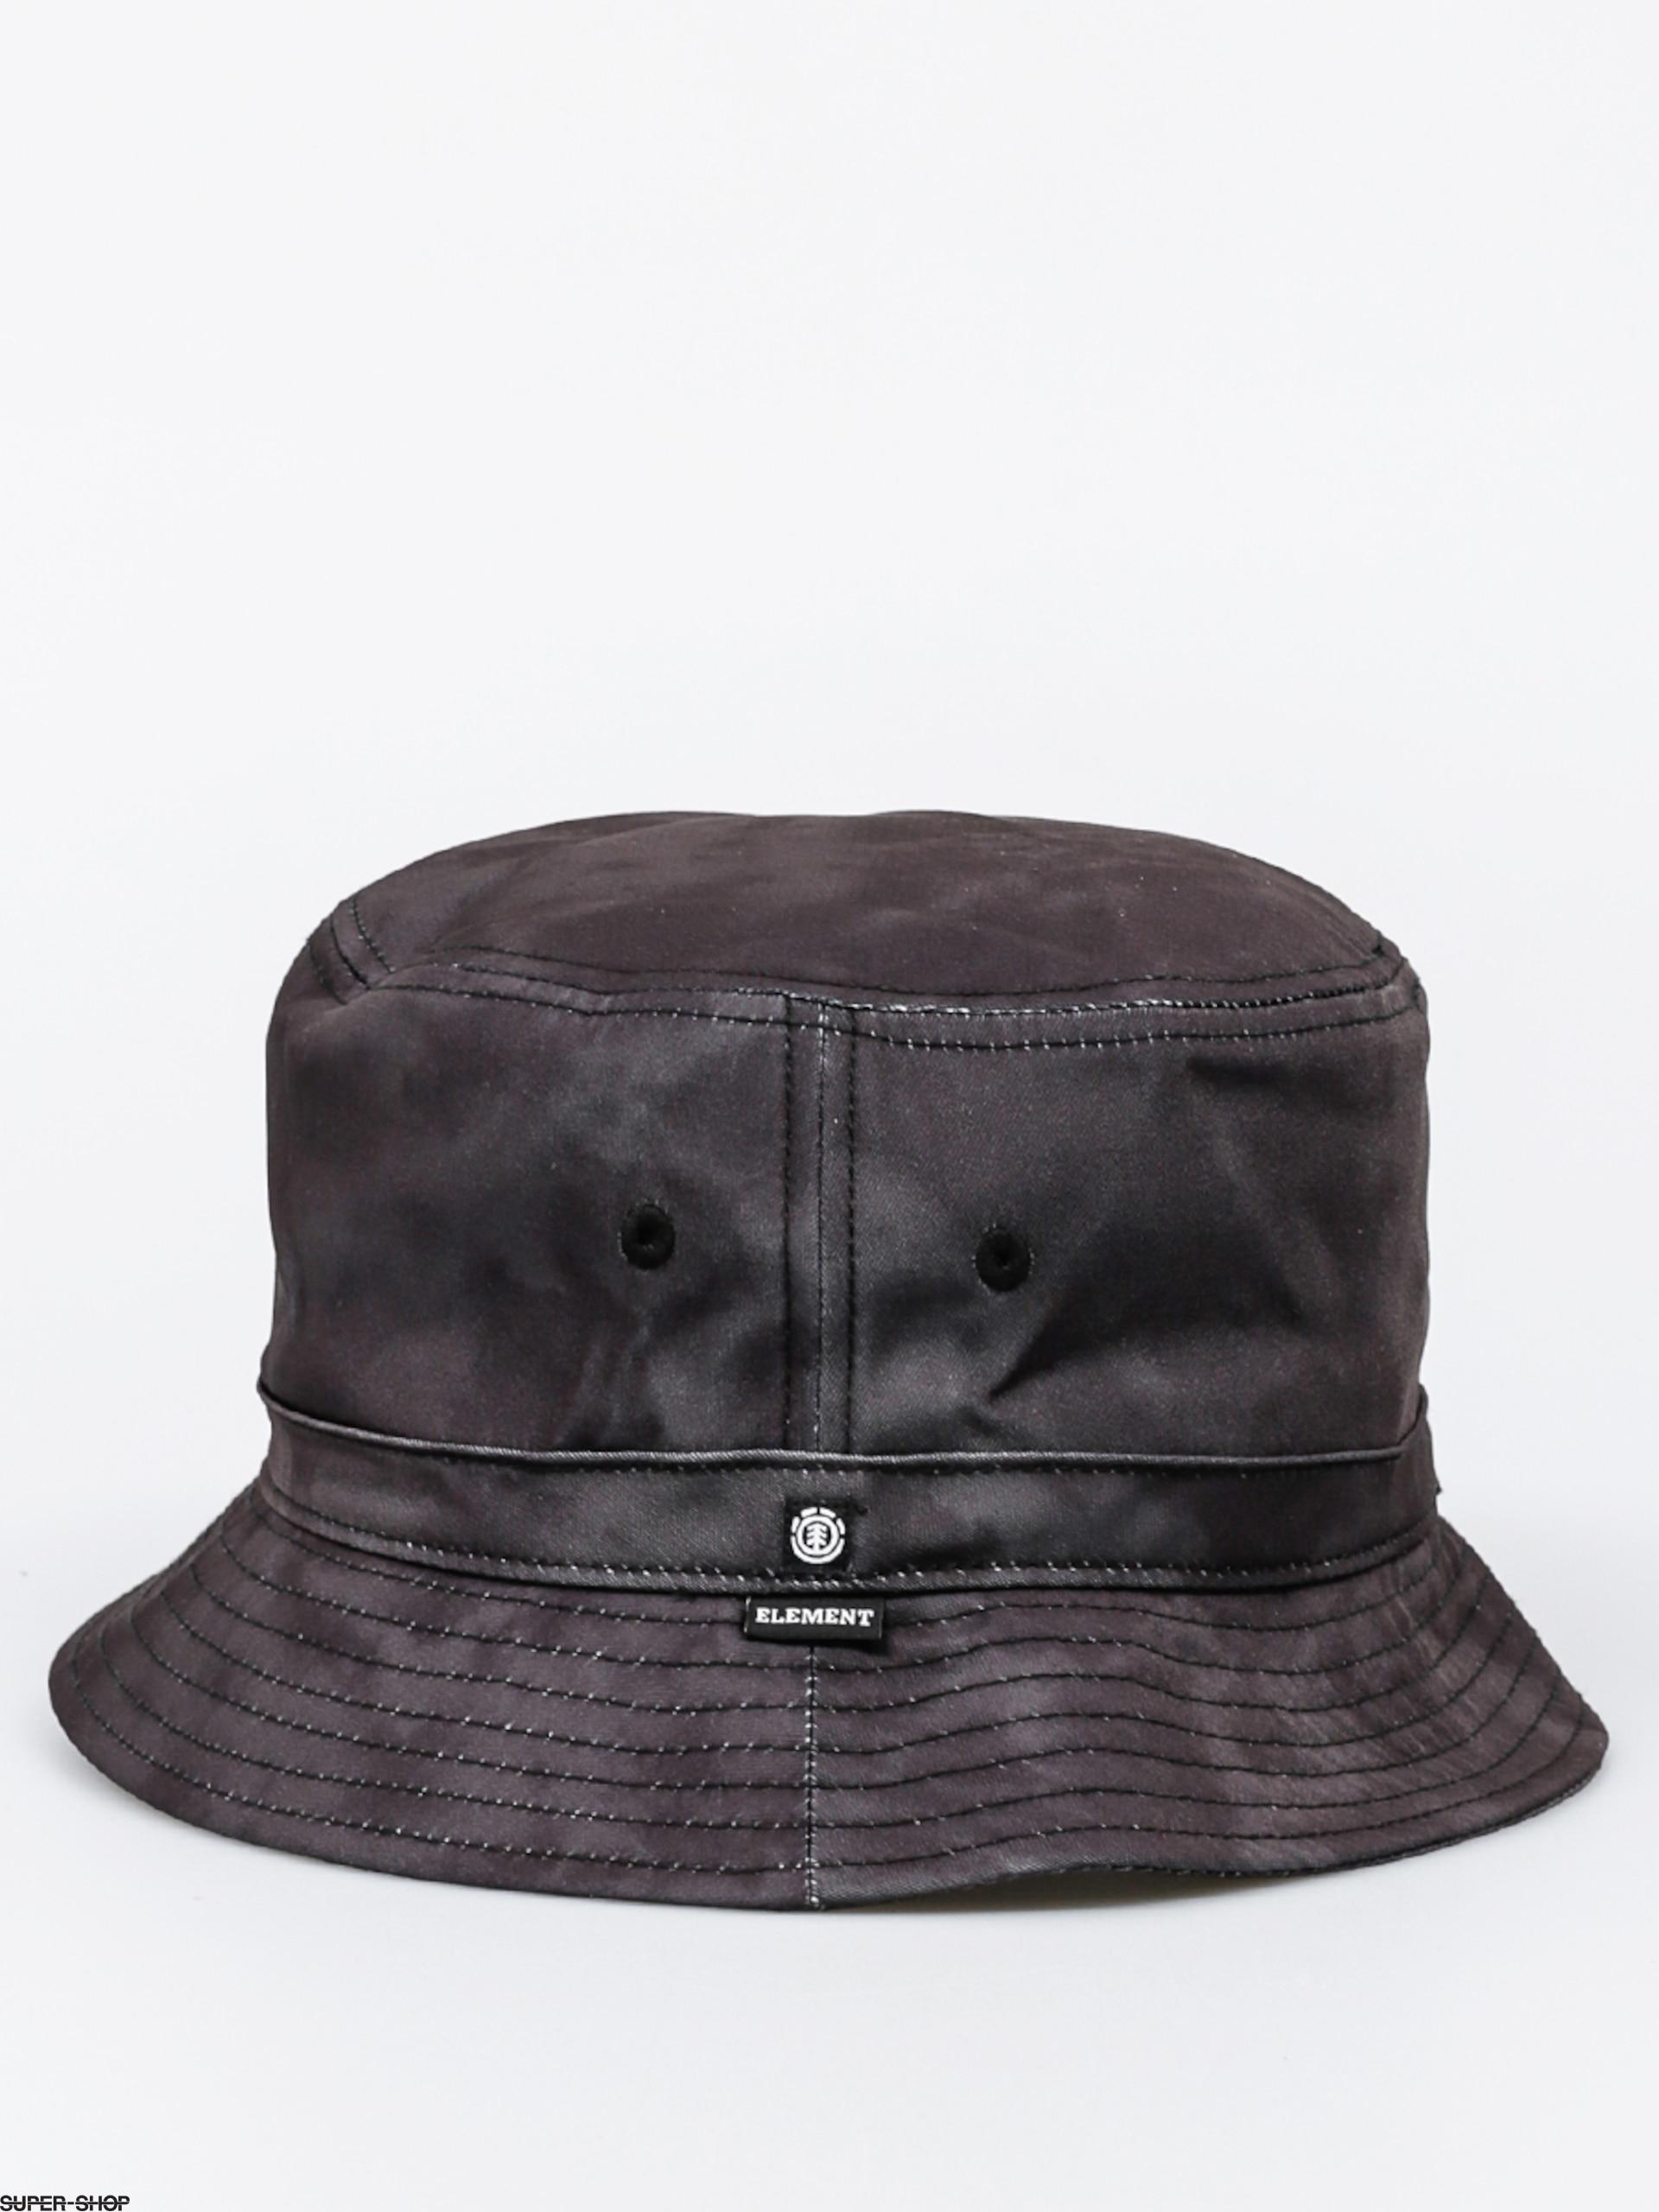 783914-w1920-element-hat-crush-bucket-flint-black.jpg 0e64b8889cf